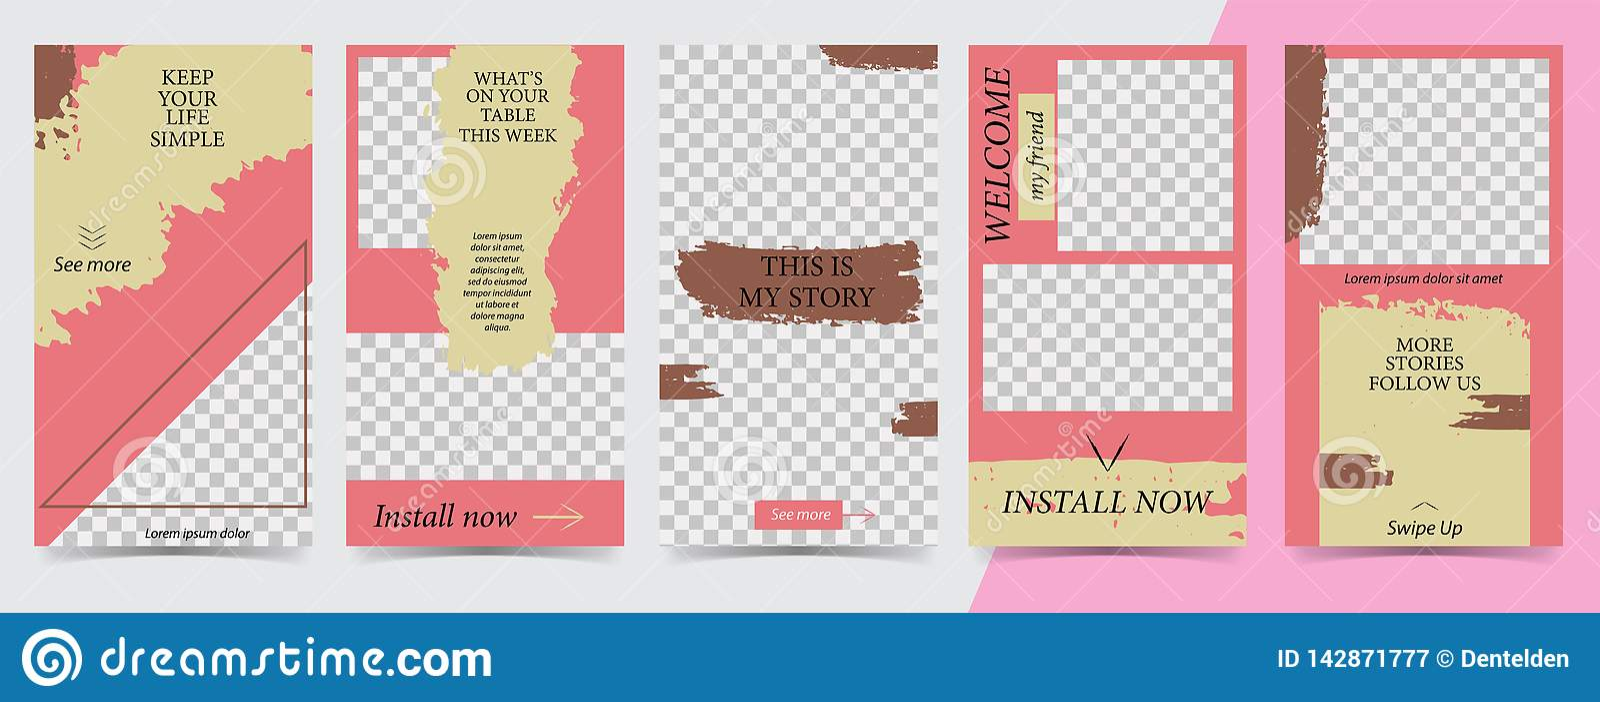 Trendy editable template for social networks stories,instagram stories,vector illustration. Design backgrounds for social media